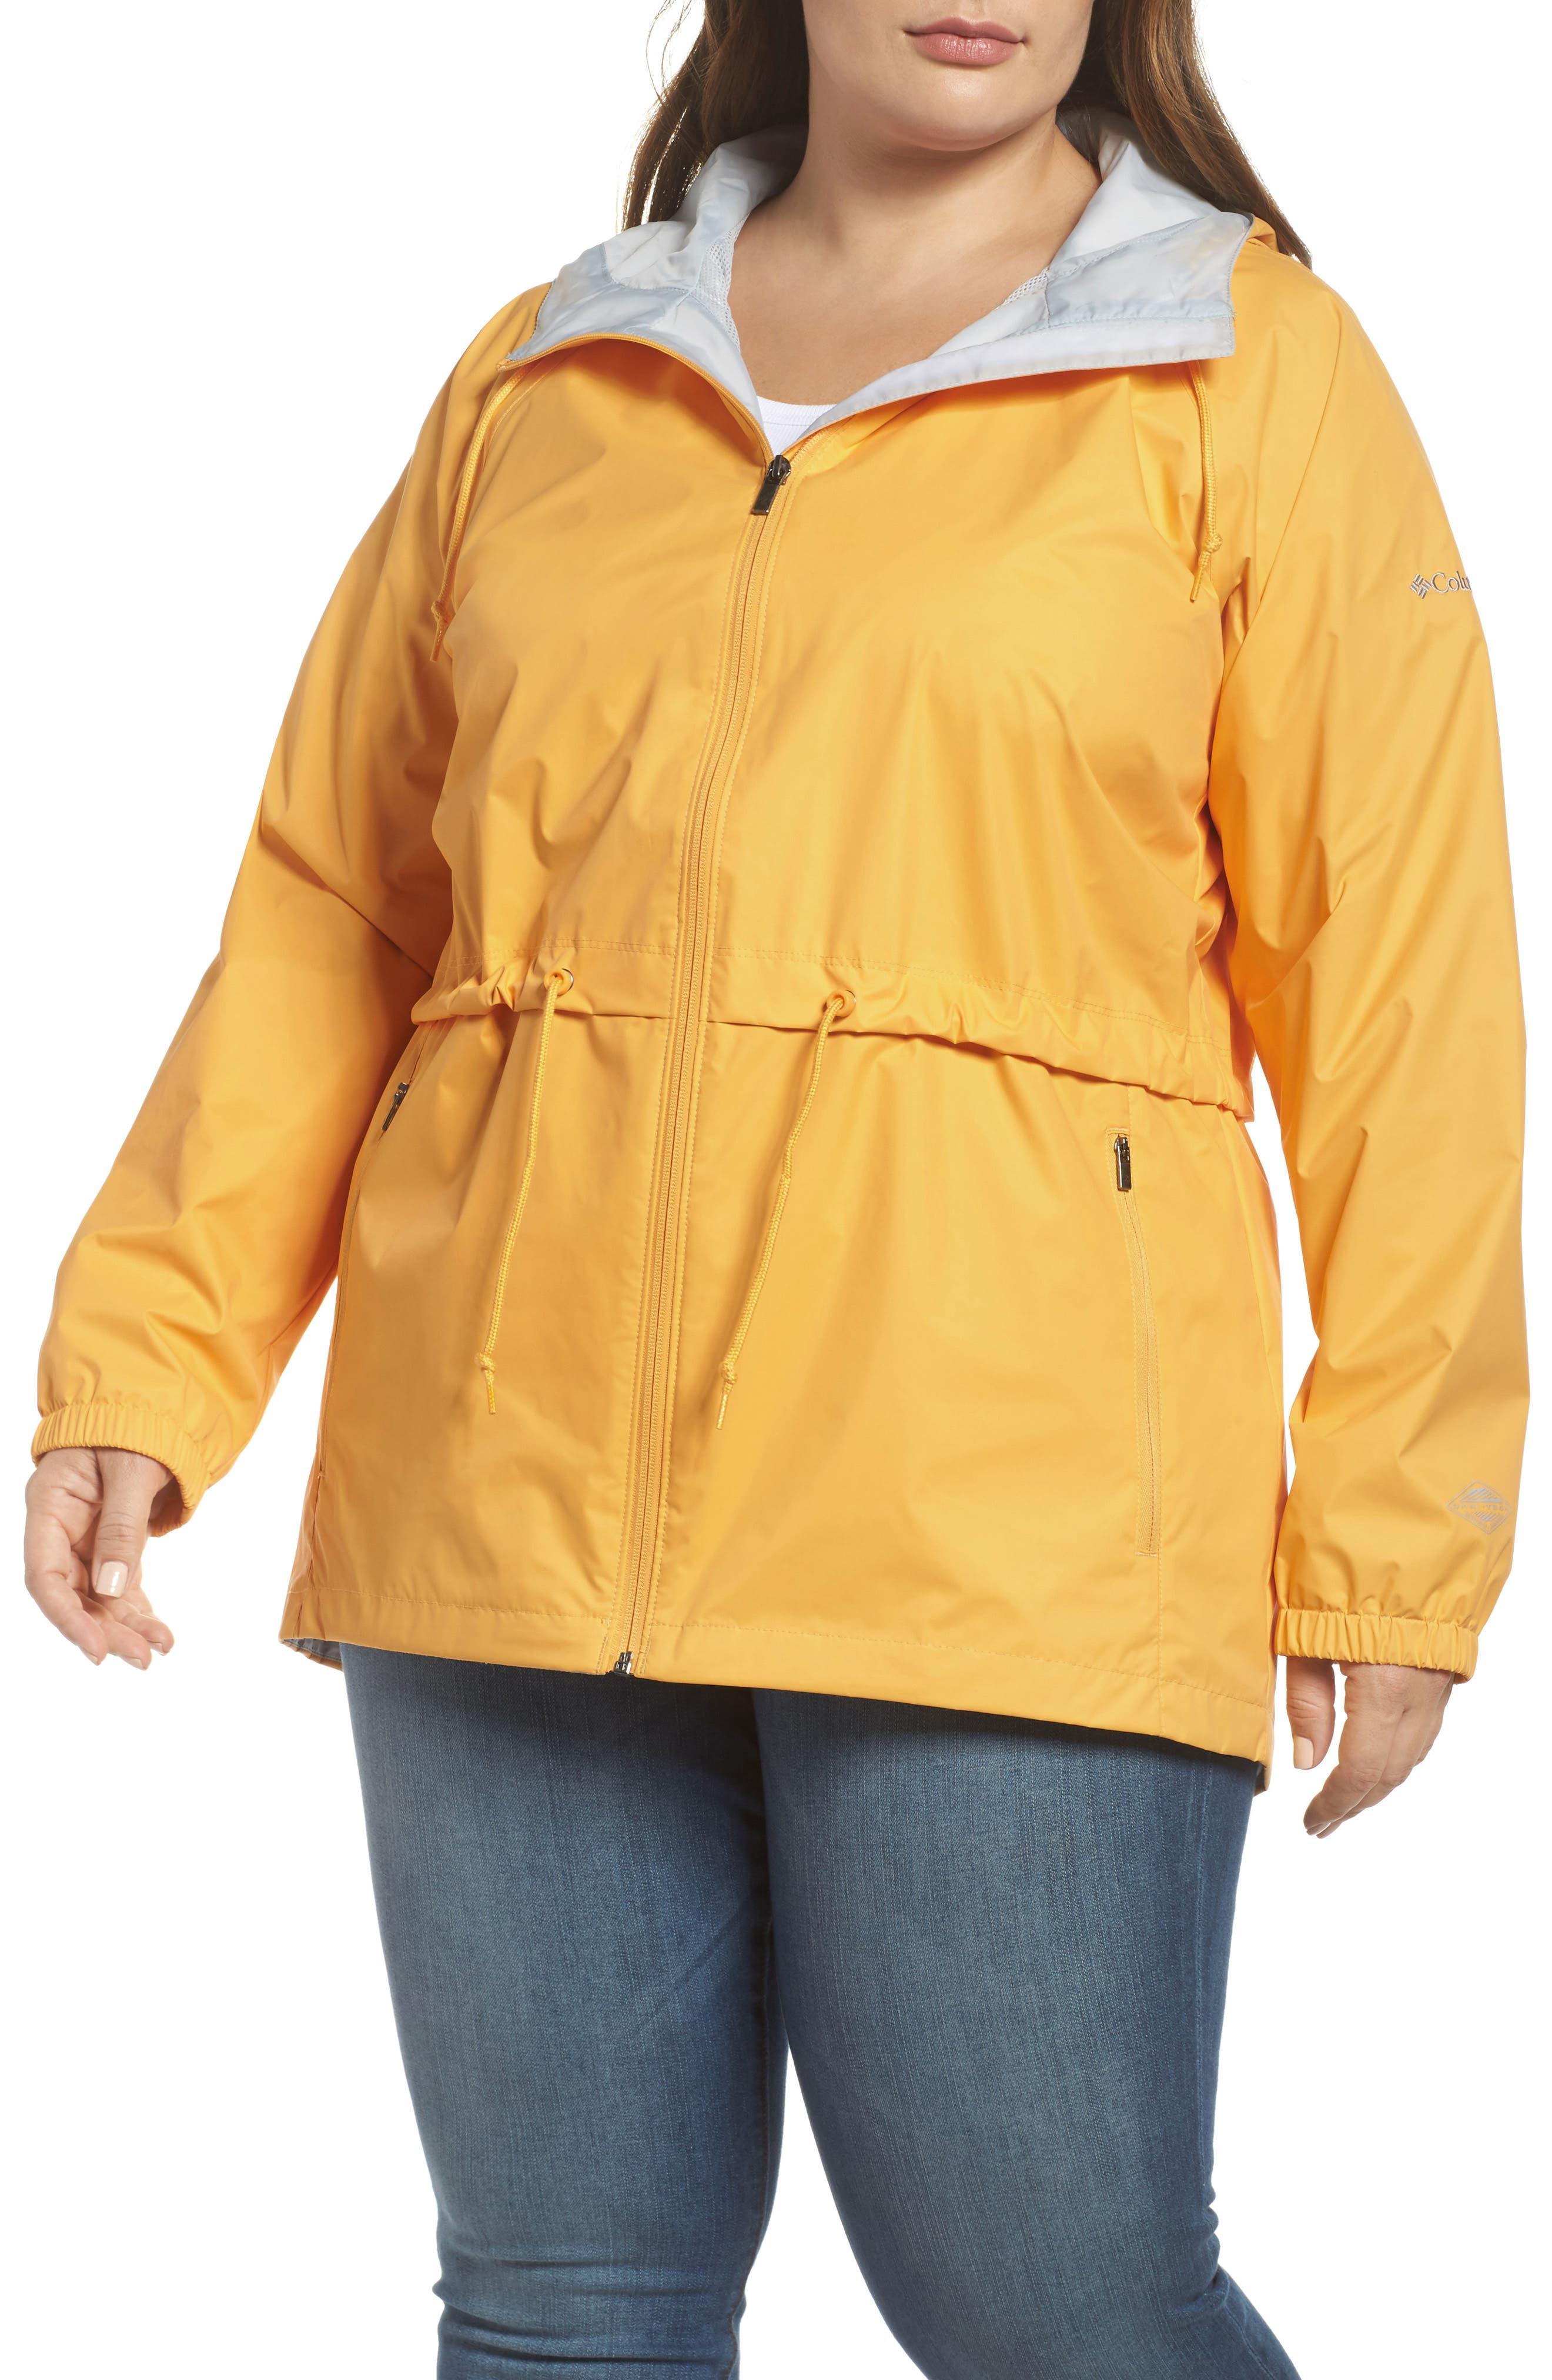 'Arcadia' Hooded Waterproof Casual Jacket,                             Alternate thumbnail 4, color,                             Yellow Ray Cirrus Grey